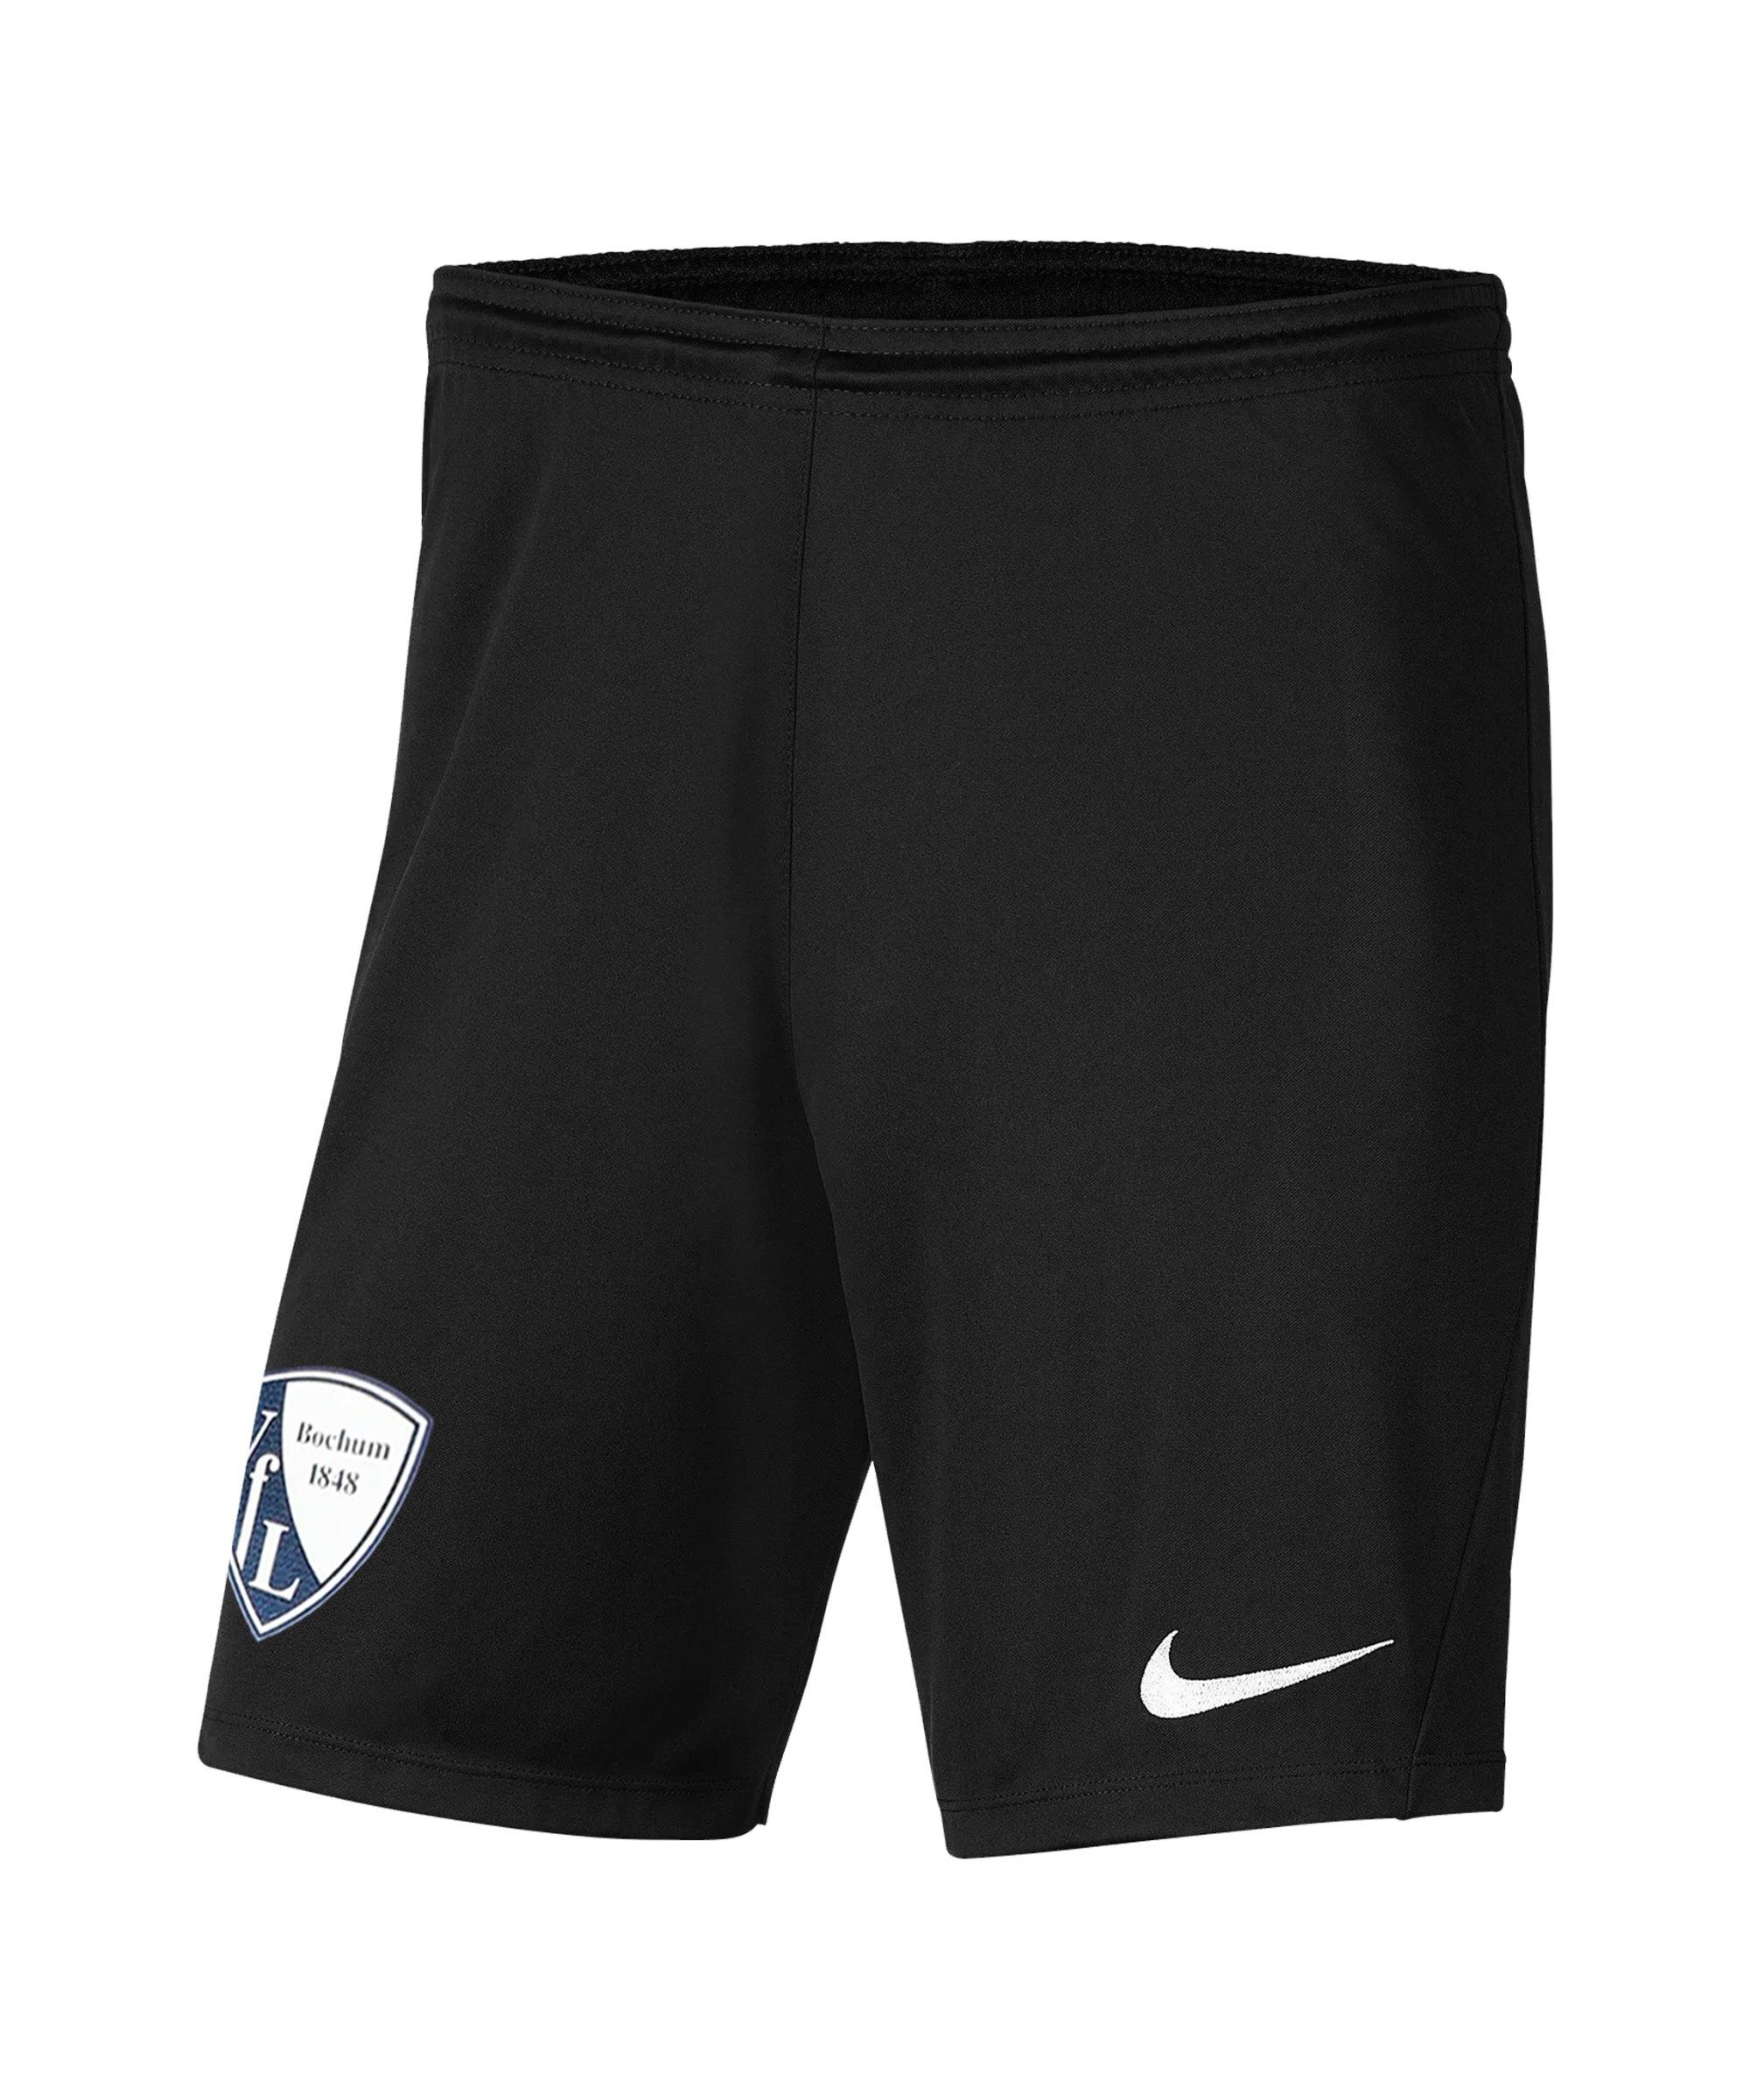 Nike VfL Bochum Torwartshort 2021/2022 Kids - schwarz